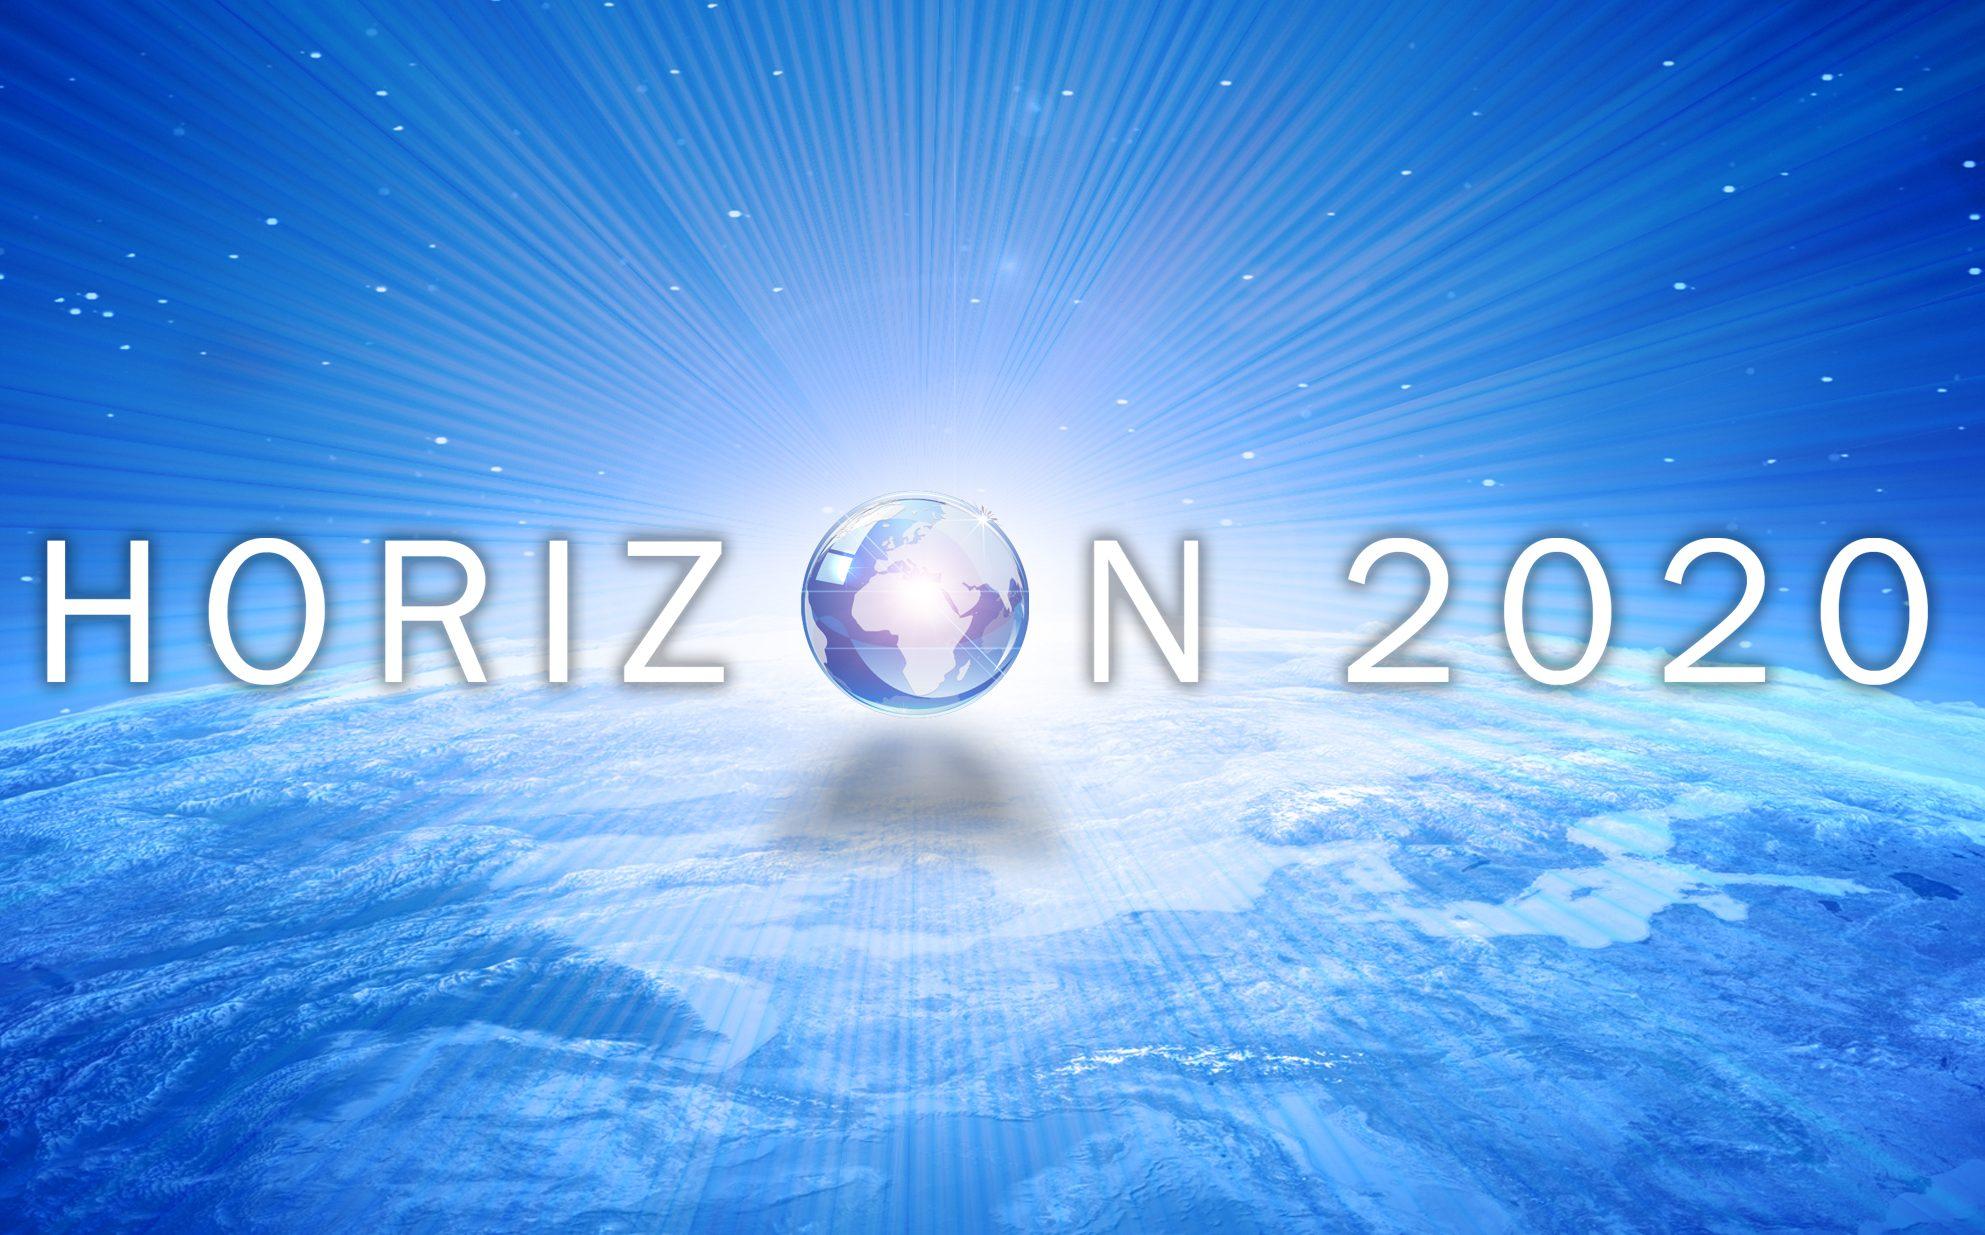 Horizon 2020 Programme